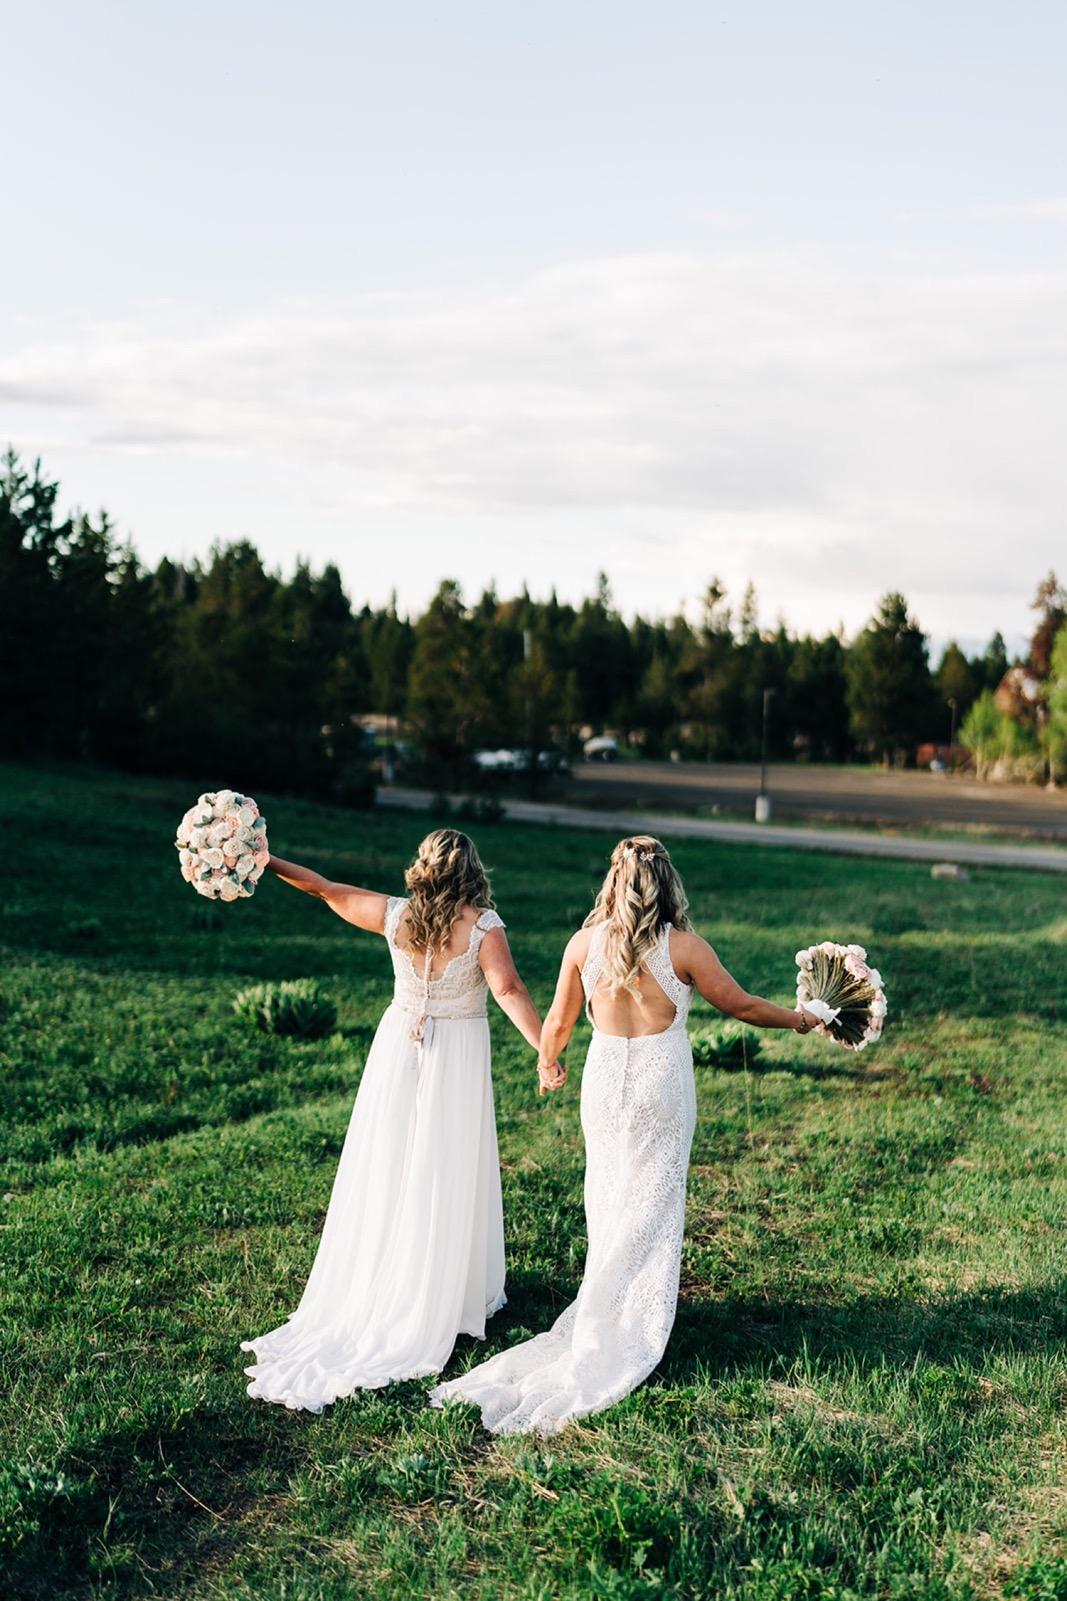 168_falissa_heather_wedding-483.jpg